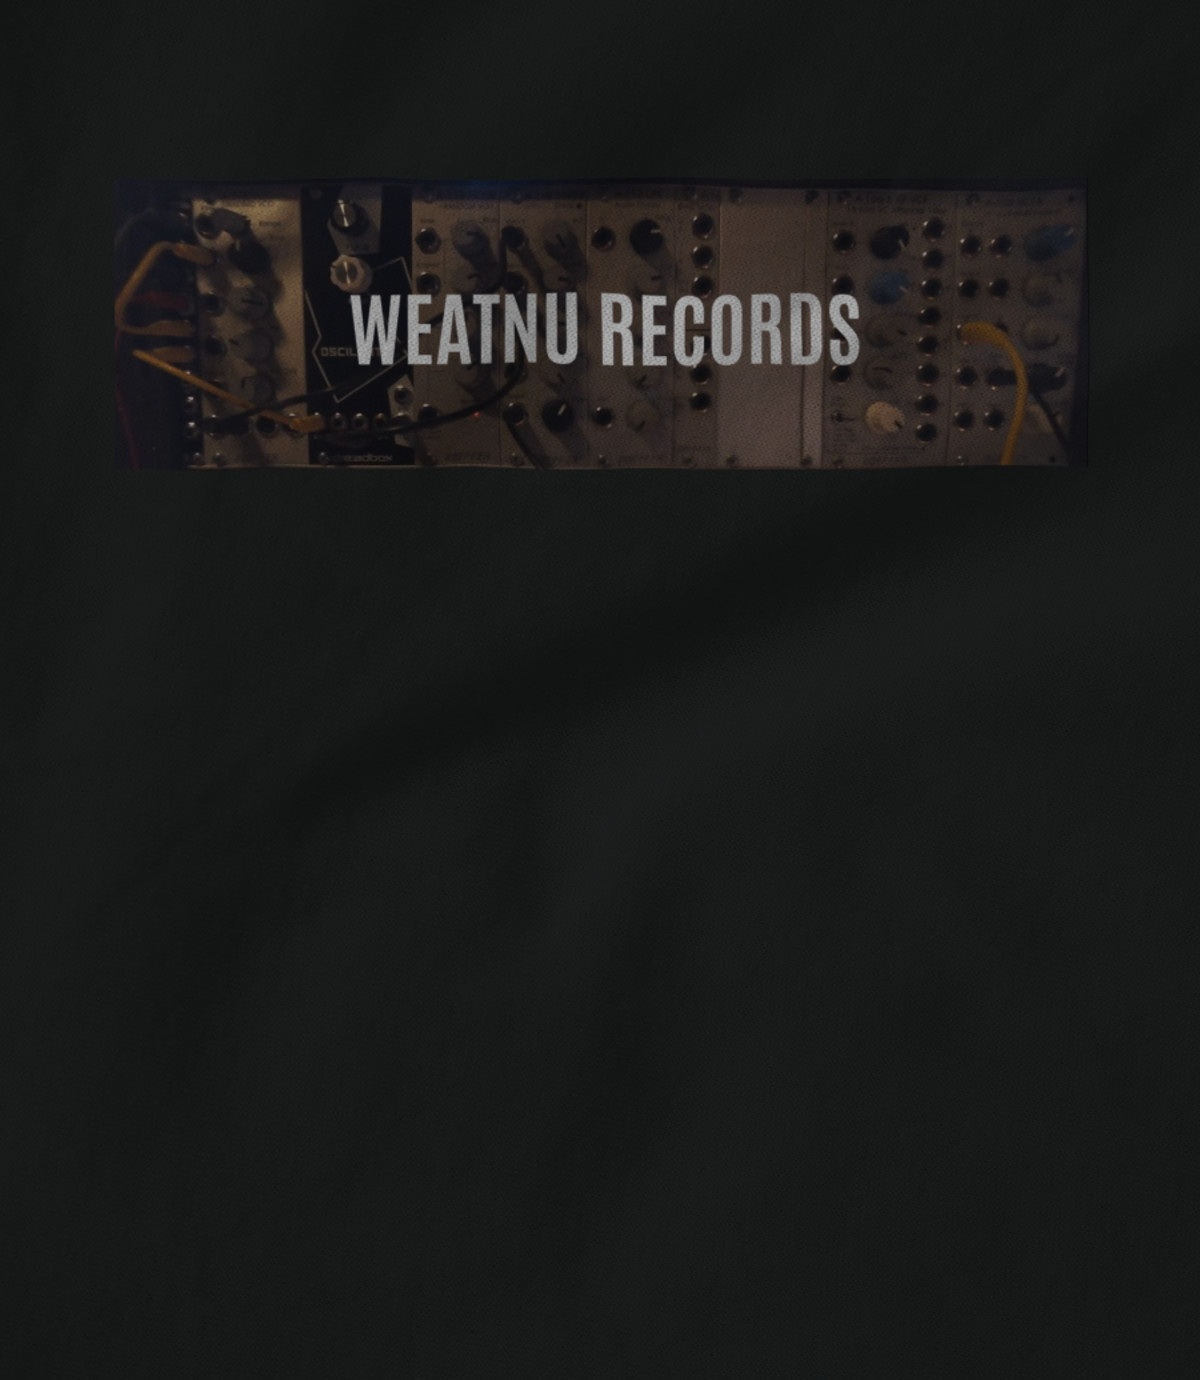 Weatnu records weatnu records  banner  2019 1552775057